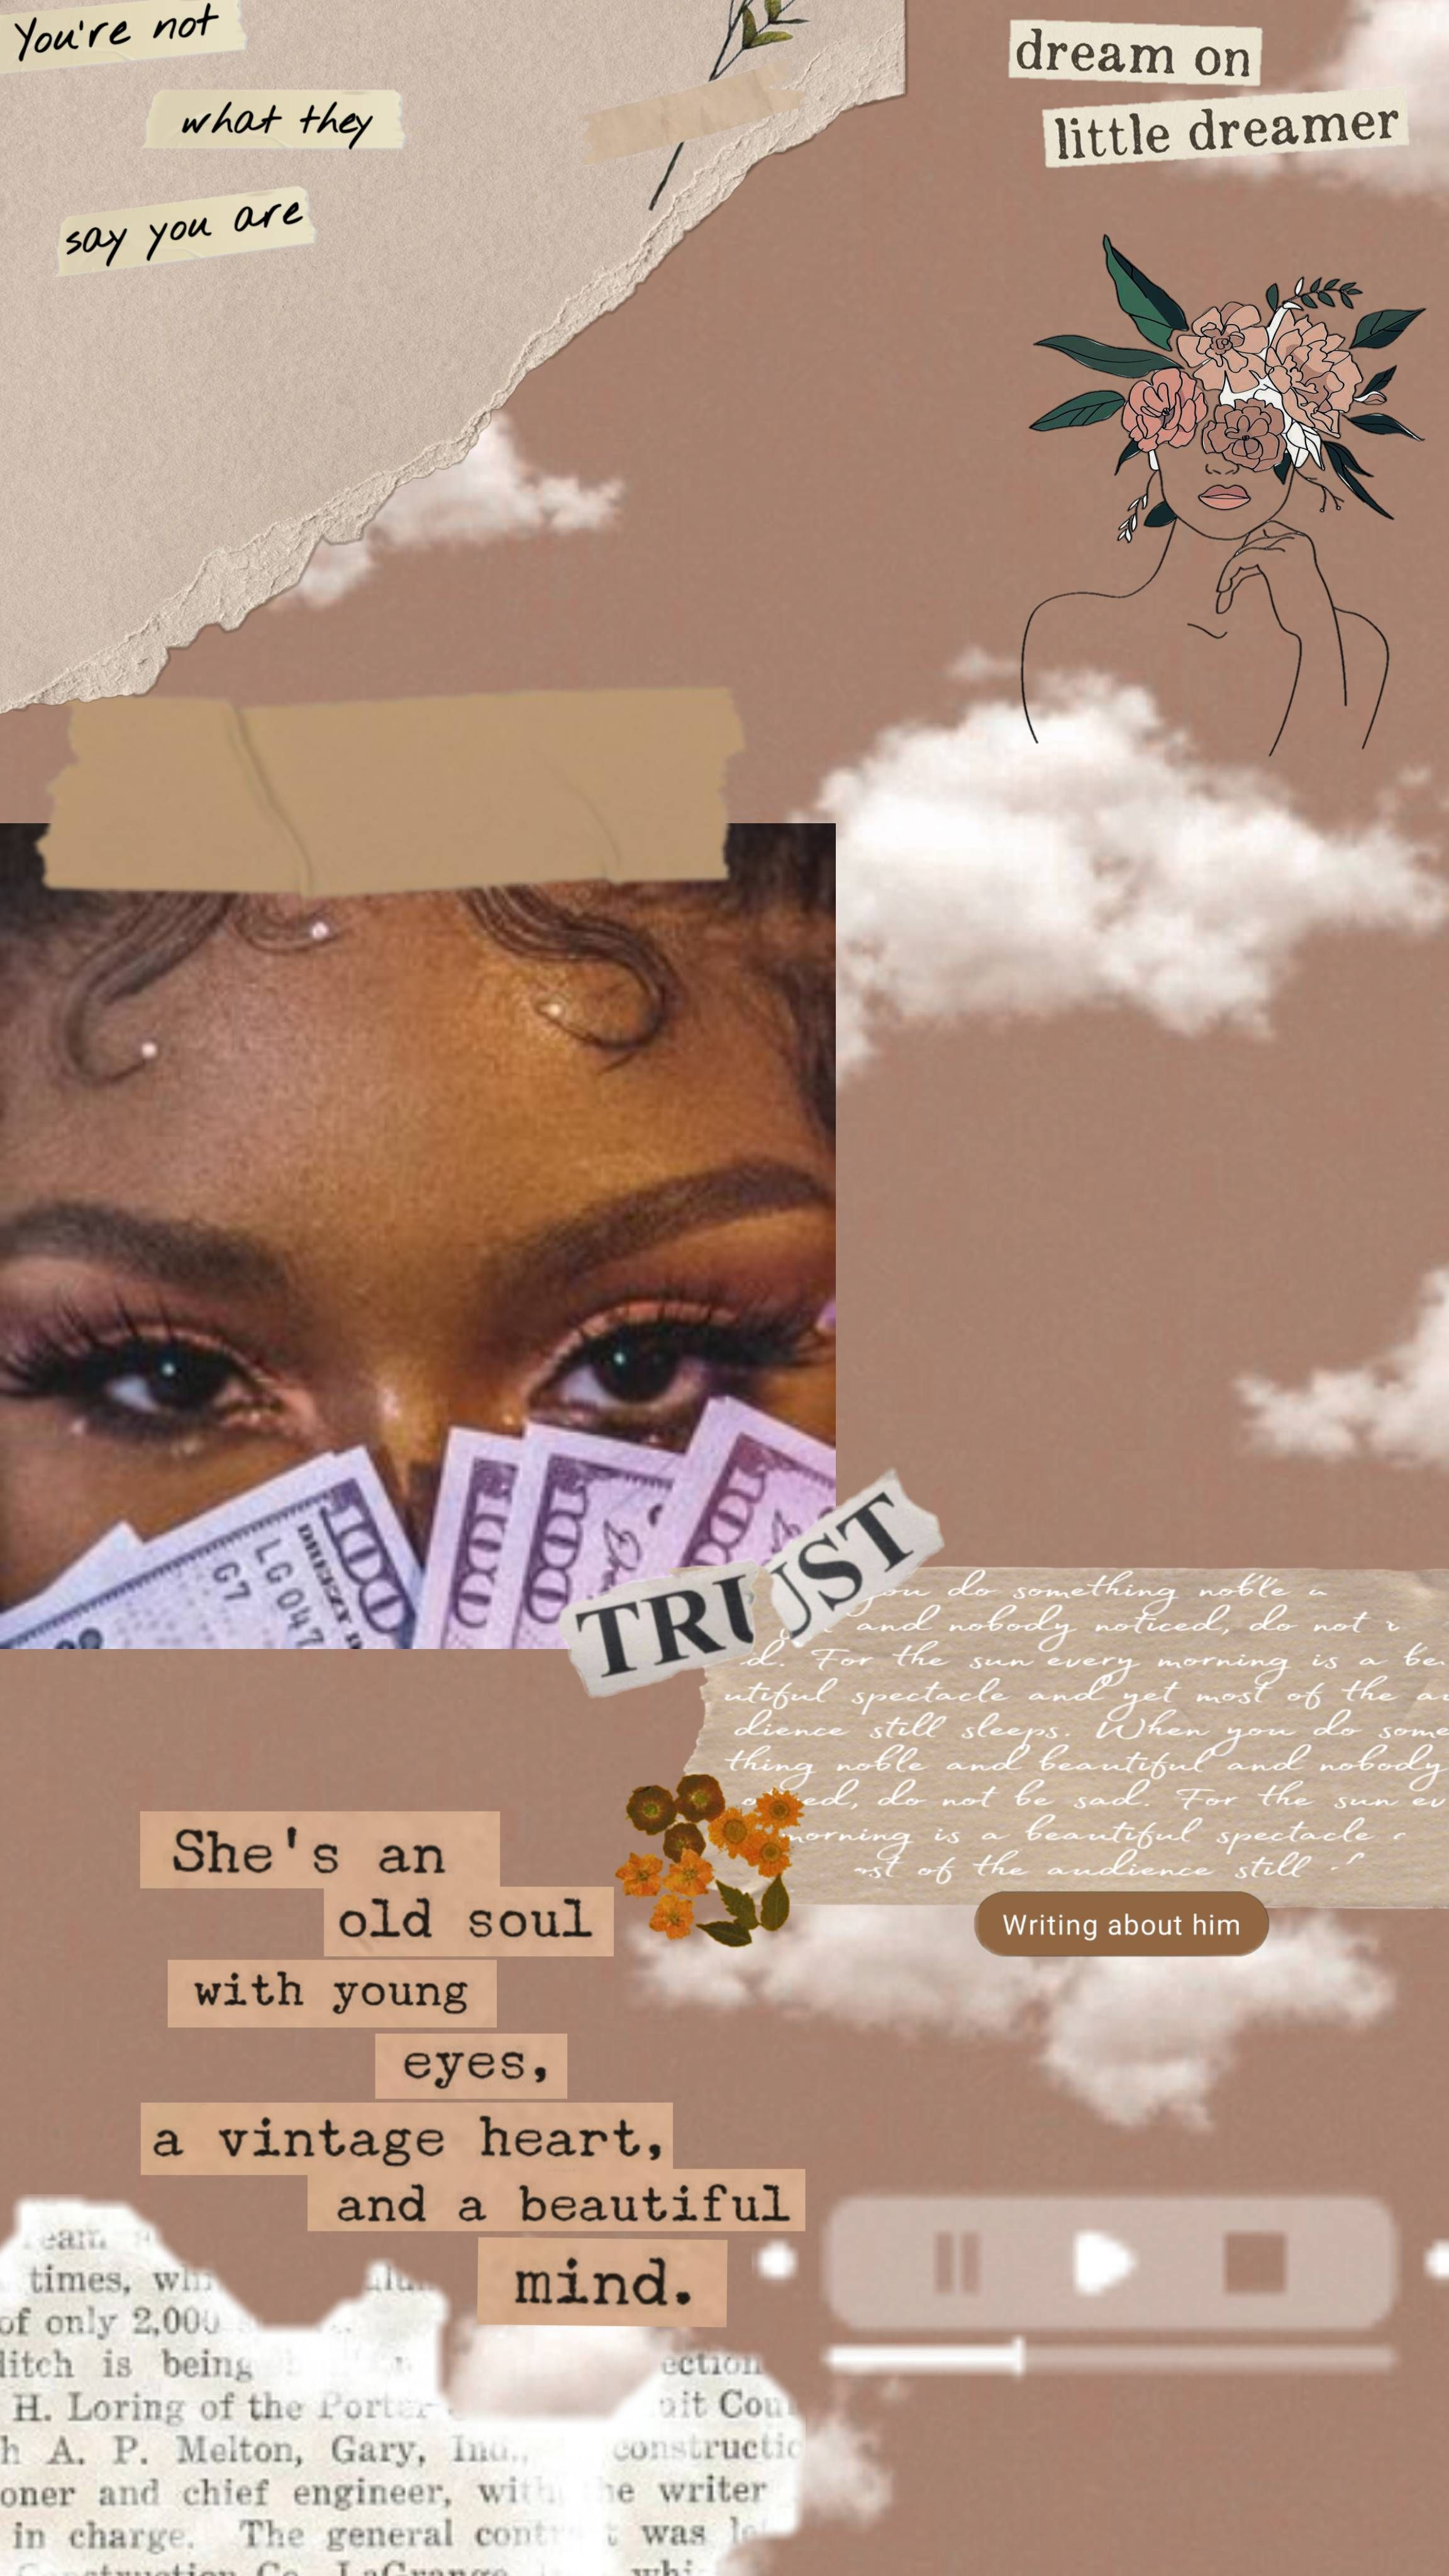 Temi Oladeji Black Aesthetic Wallpaper Iphone Wallpaper Tumblr Aesthetic Bad Girl Wallpaper